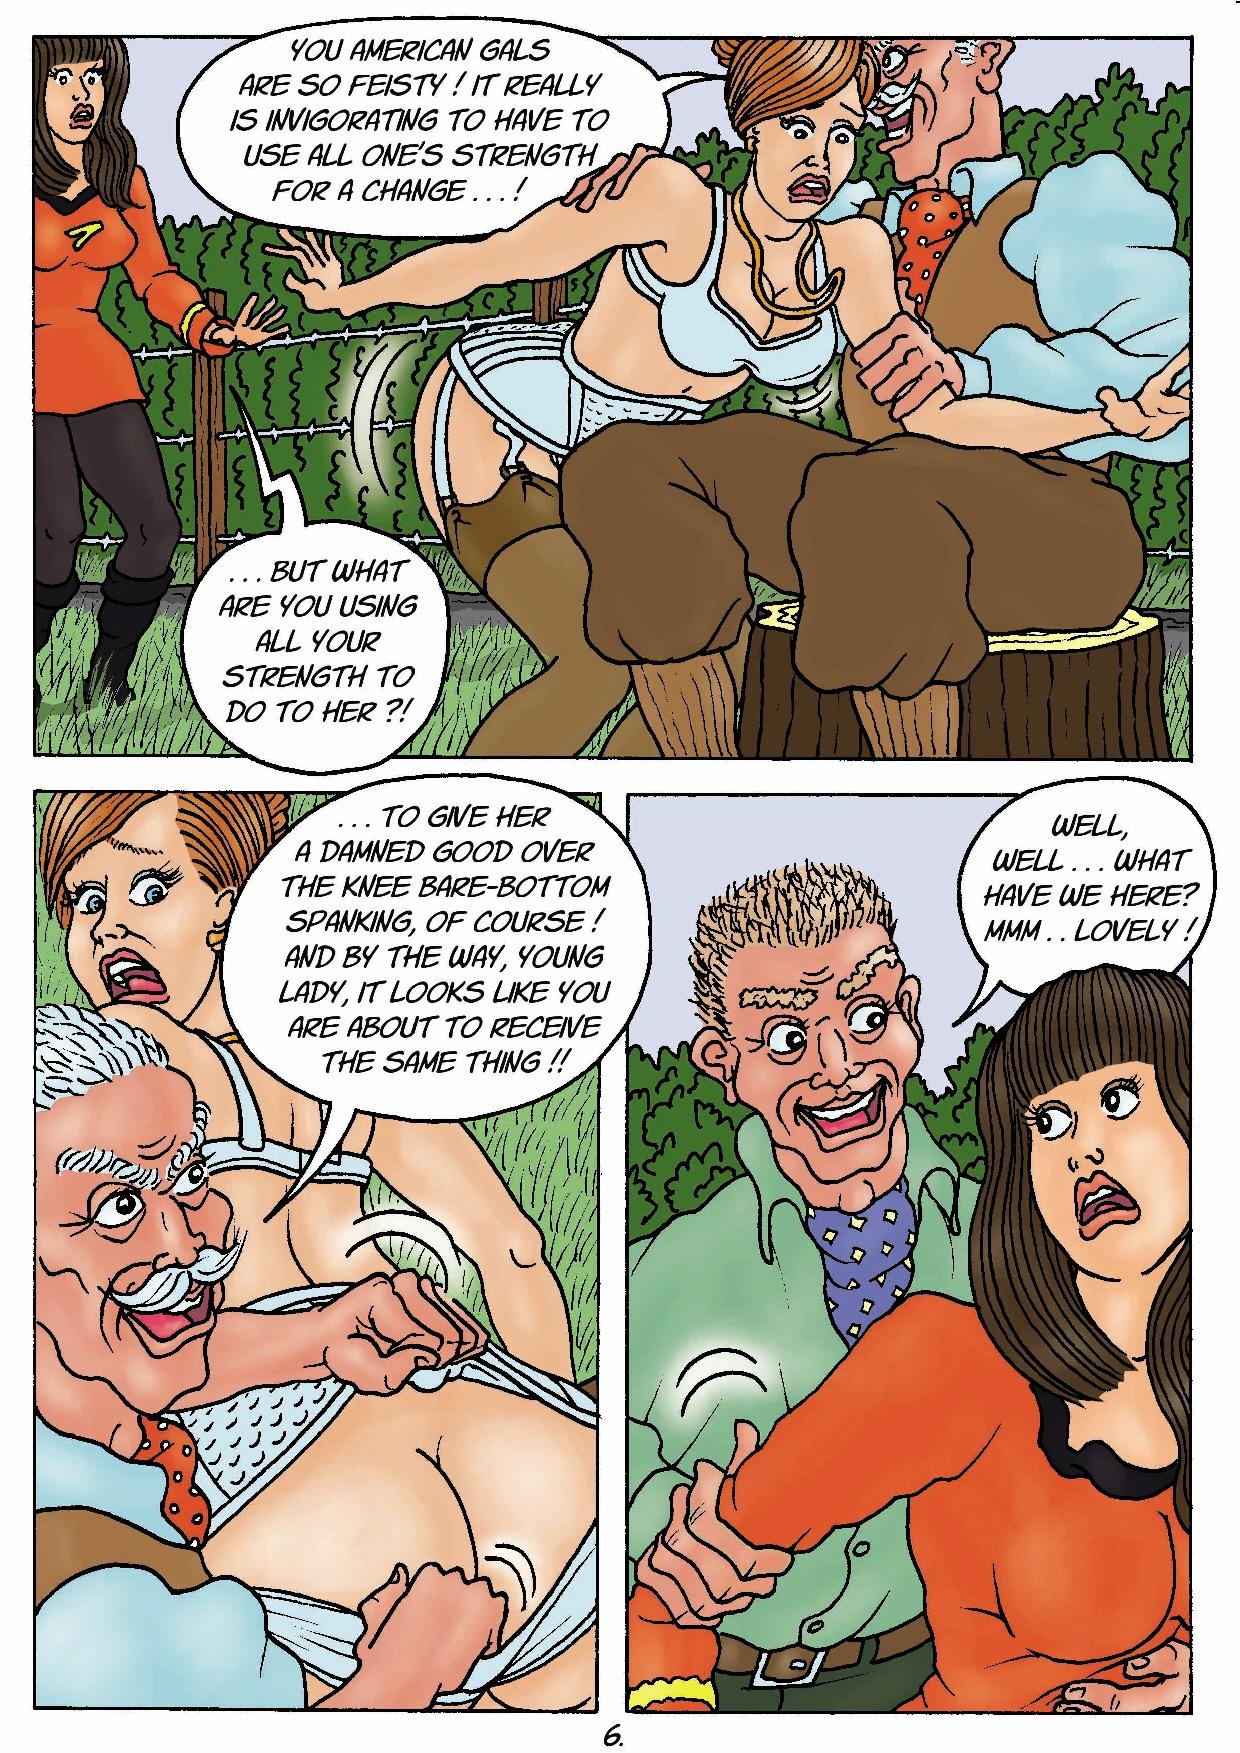 Femdom sissy sex stories